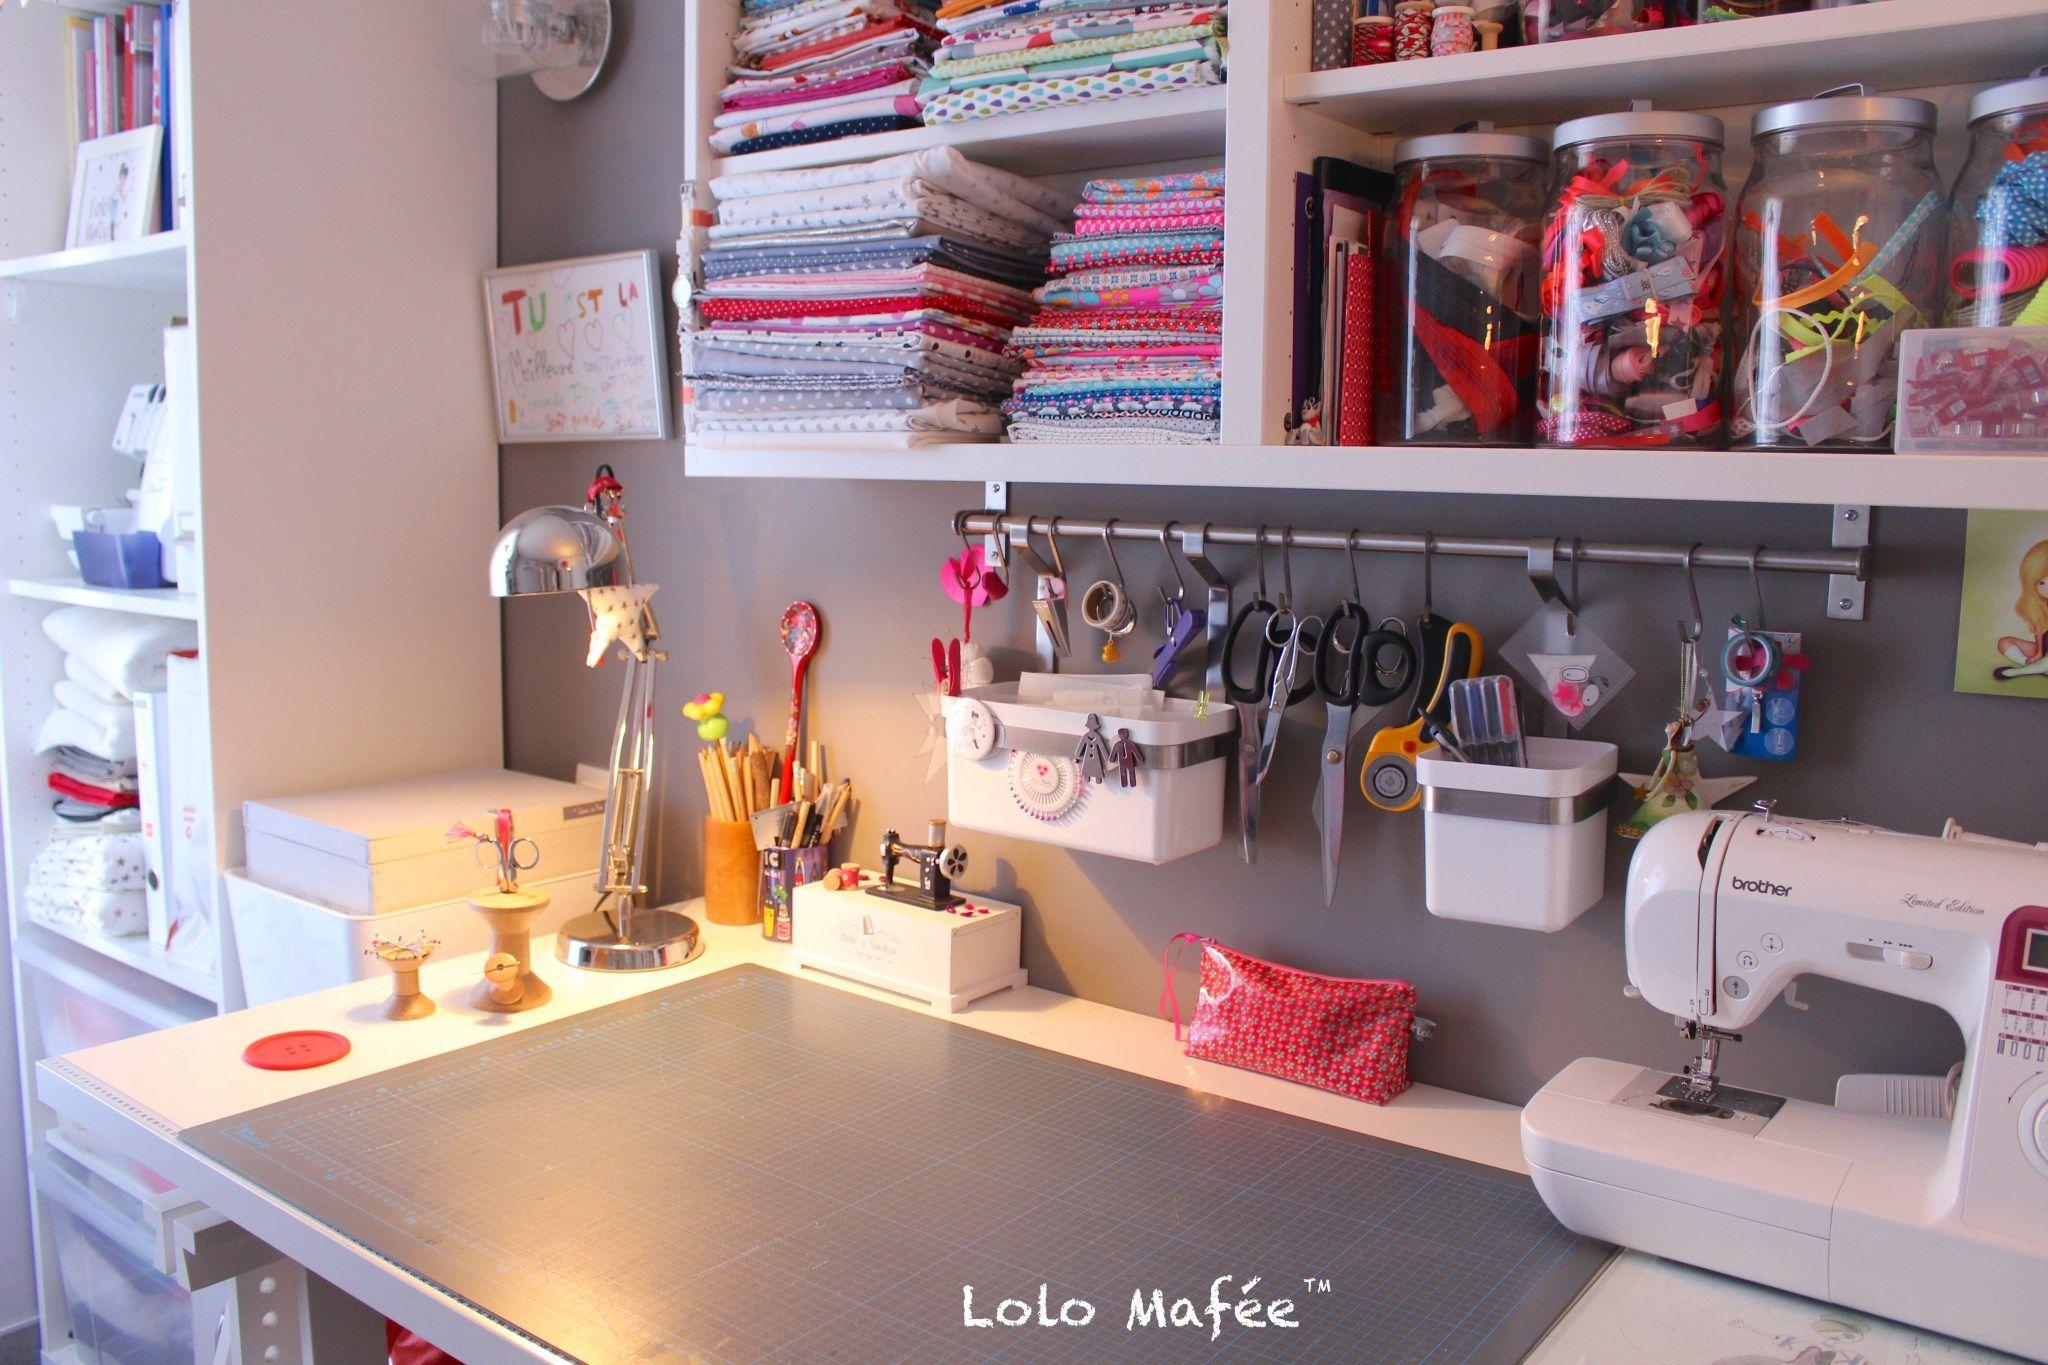 Deco 12 Idees Pour Amenager Son Atelier Couture Dans Un Petit Espace Atelier Couture Amenagement Espaces De Couture Rangement Couture